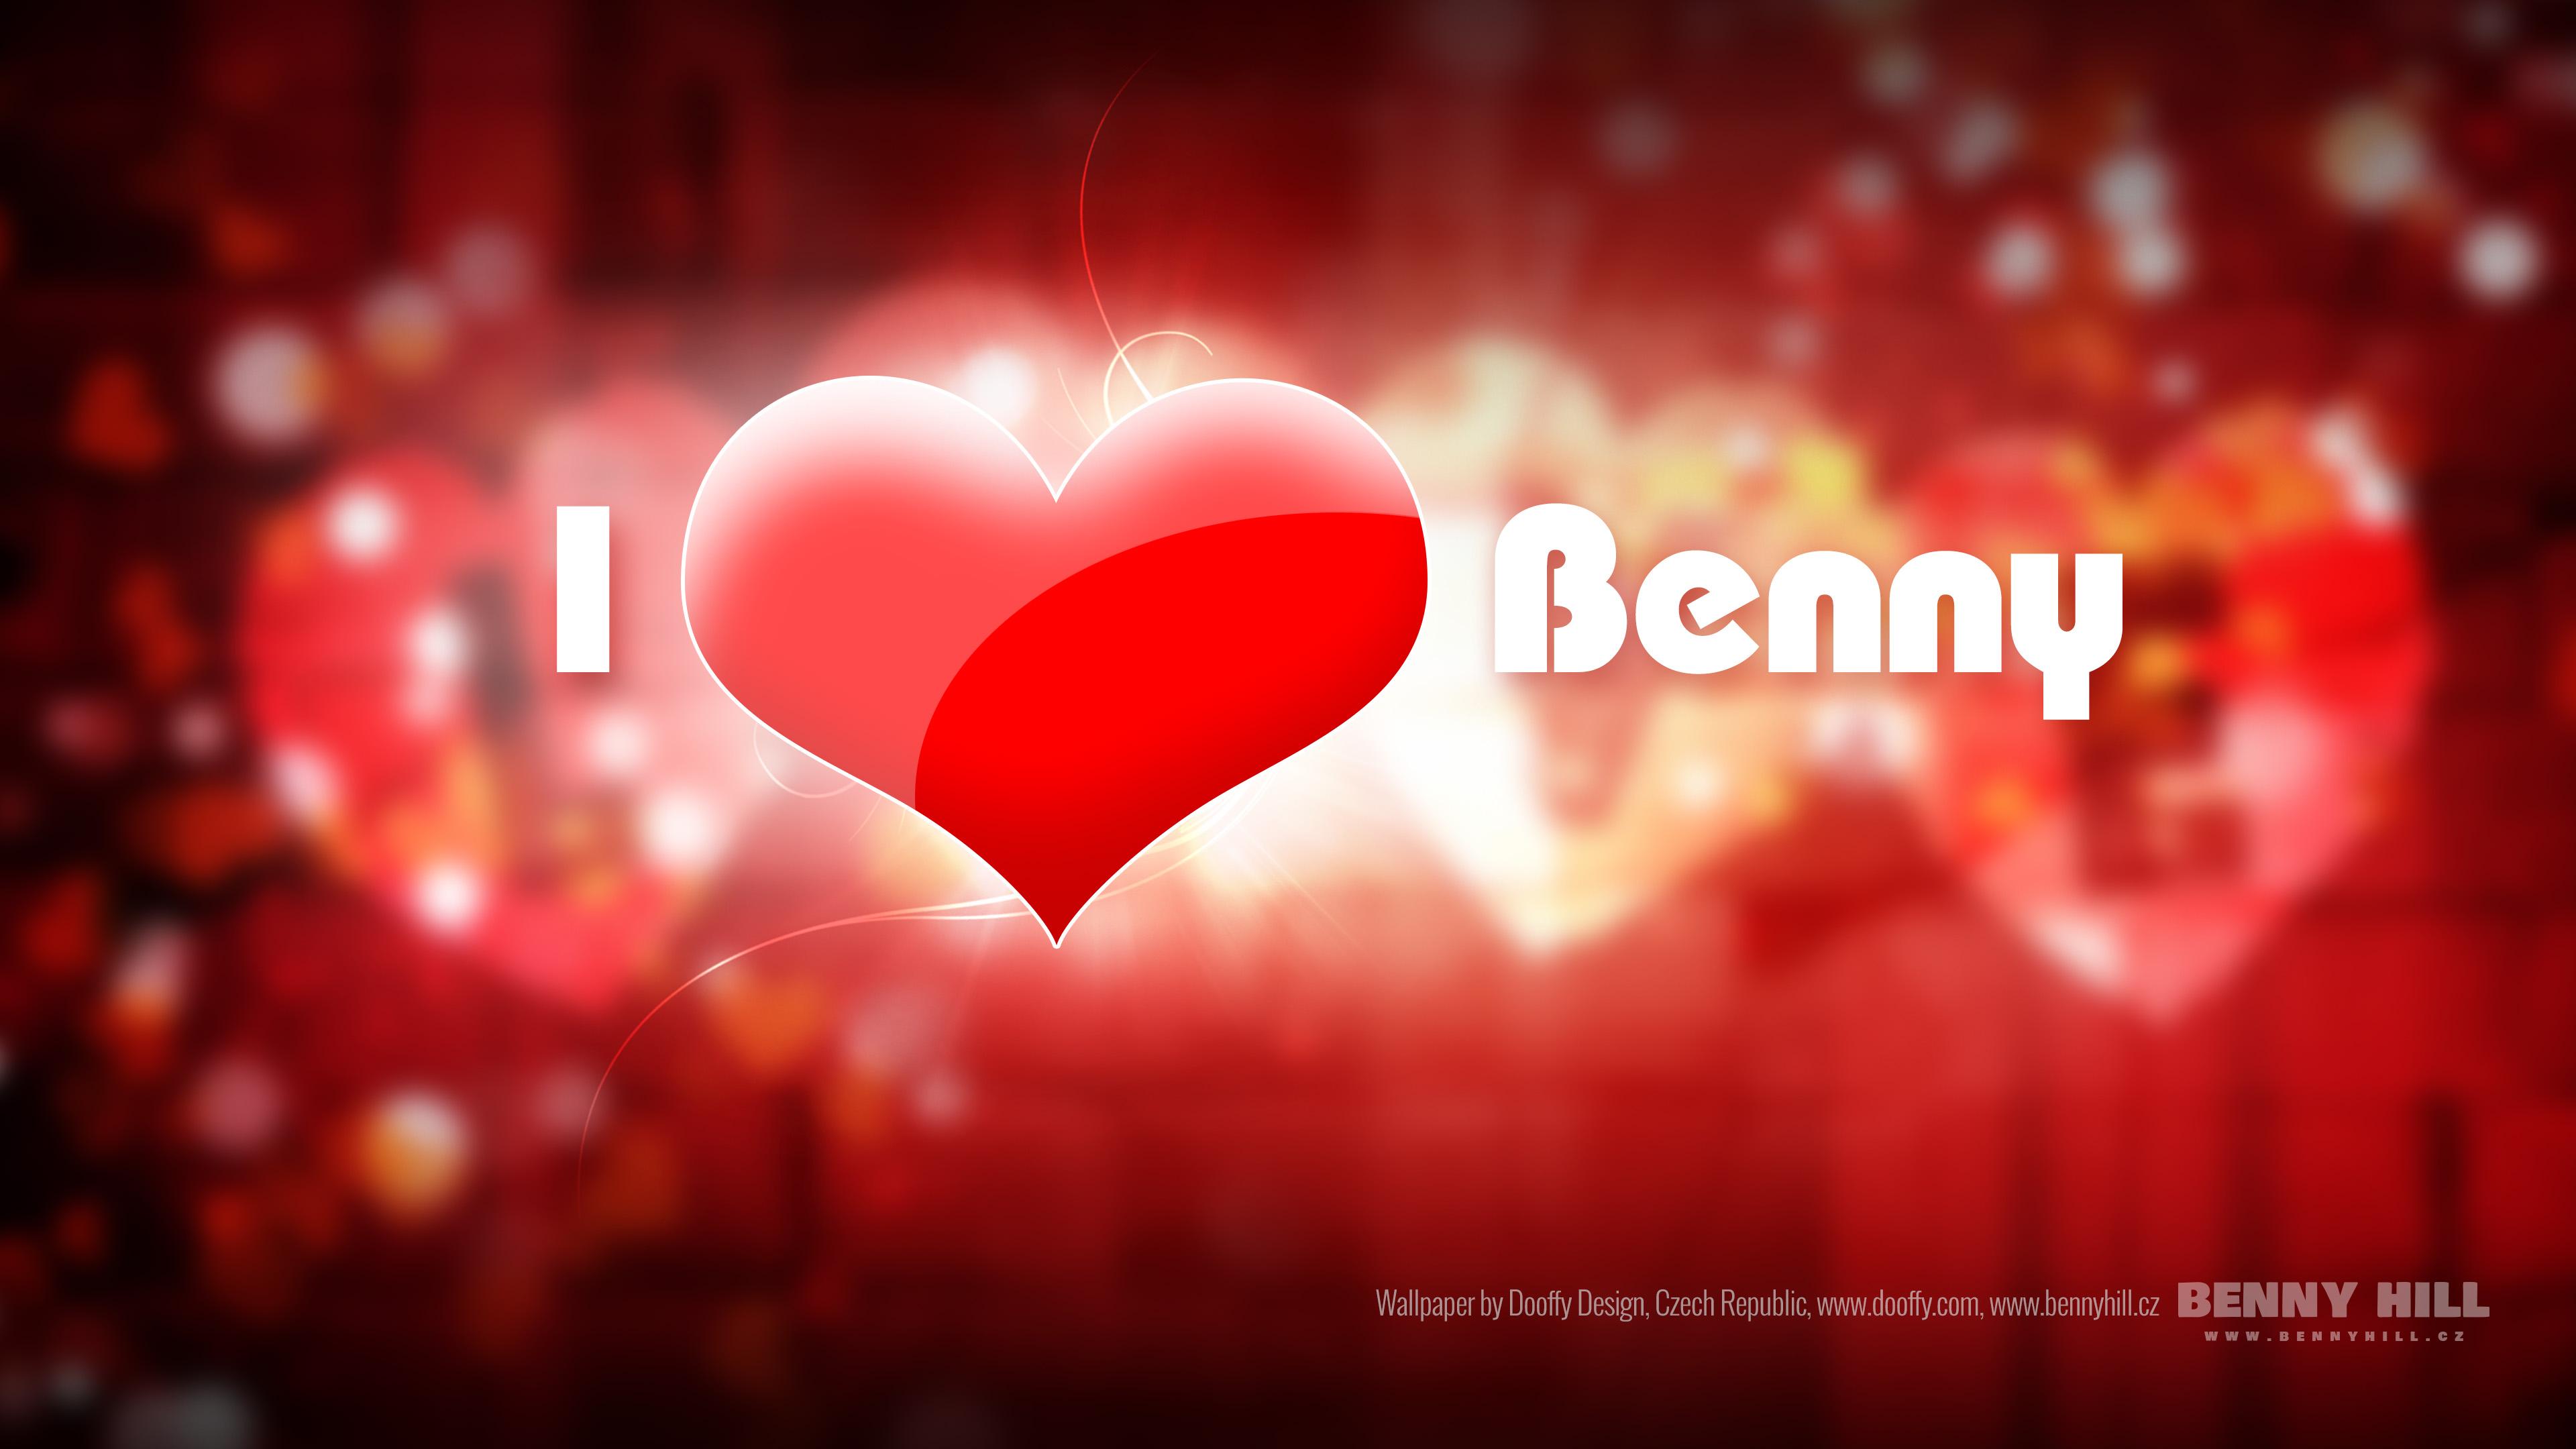 Love Wallpaper Uhd : Wallpaper I love Benny (UHD 4K 3840x2160px) by Dooffy-Design on DeviantArt